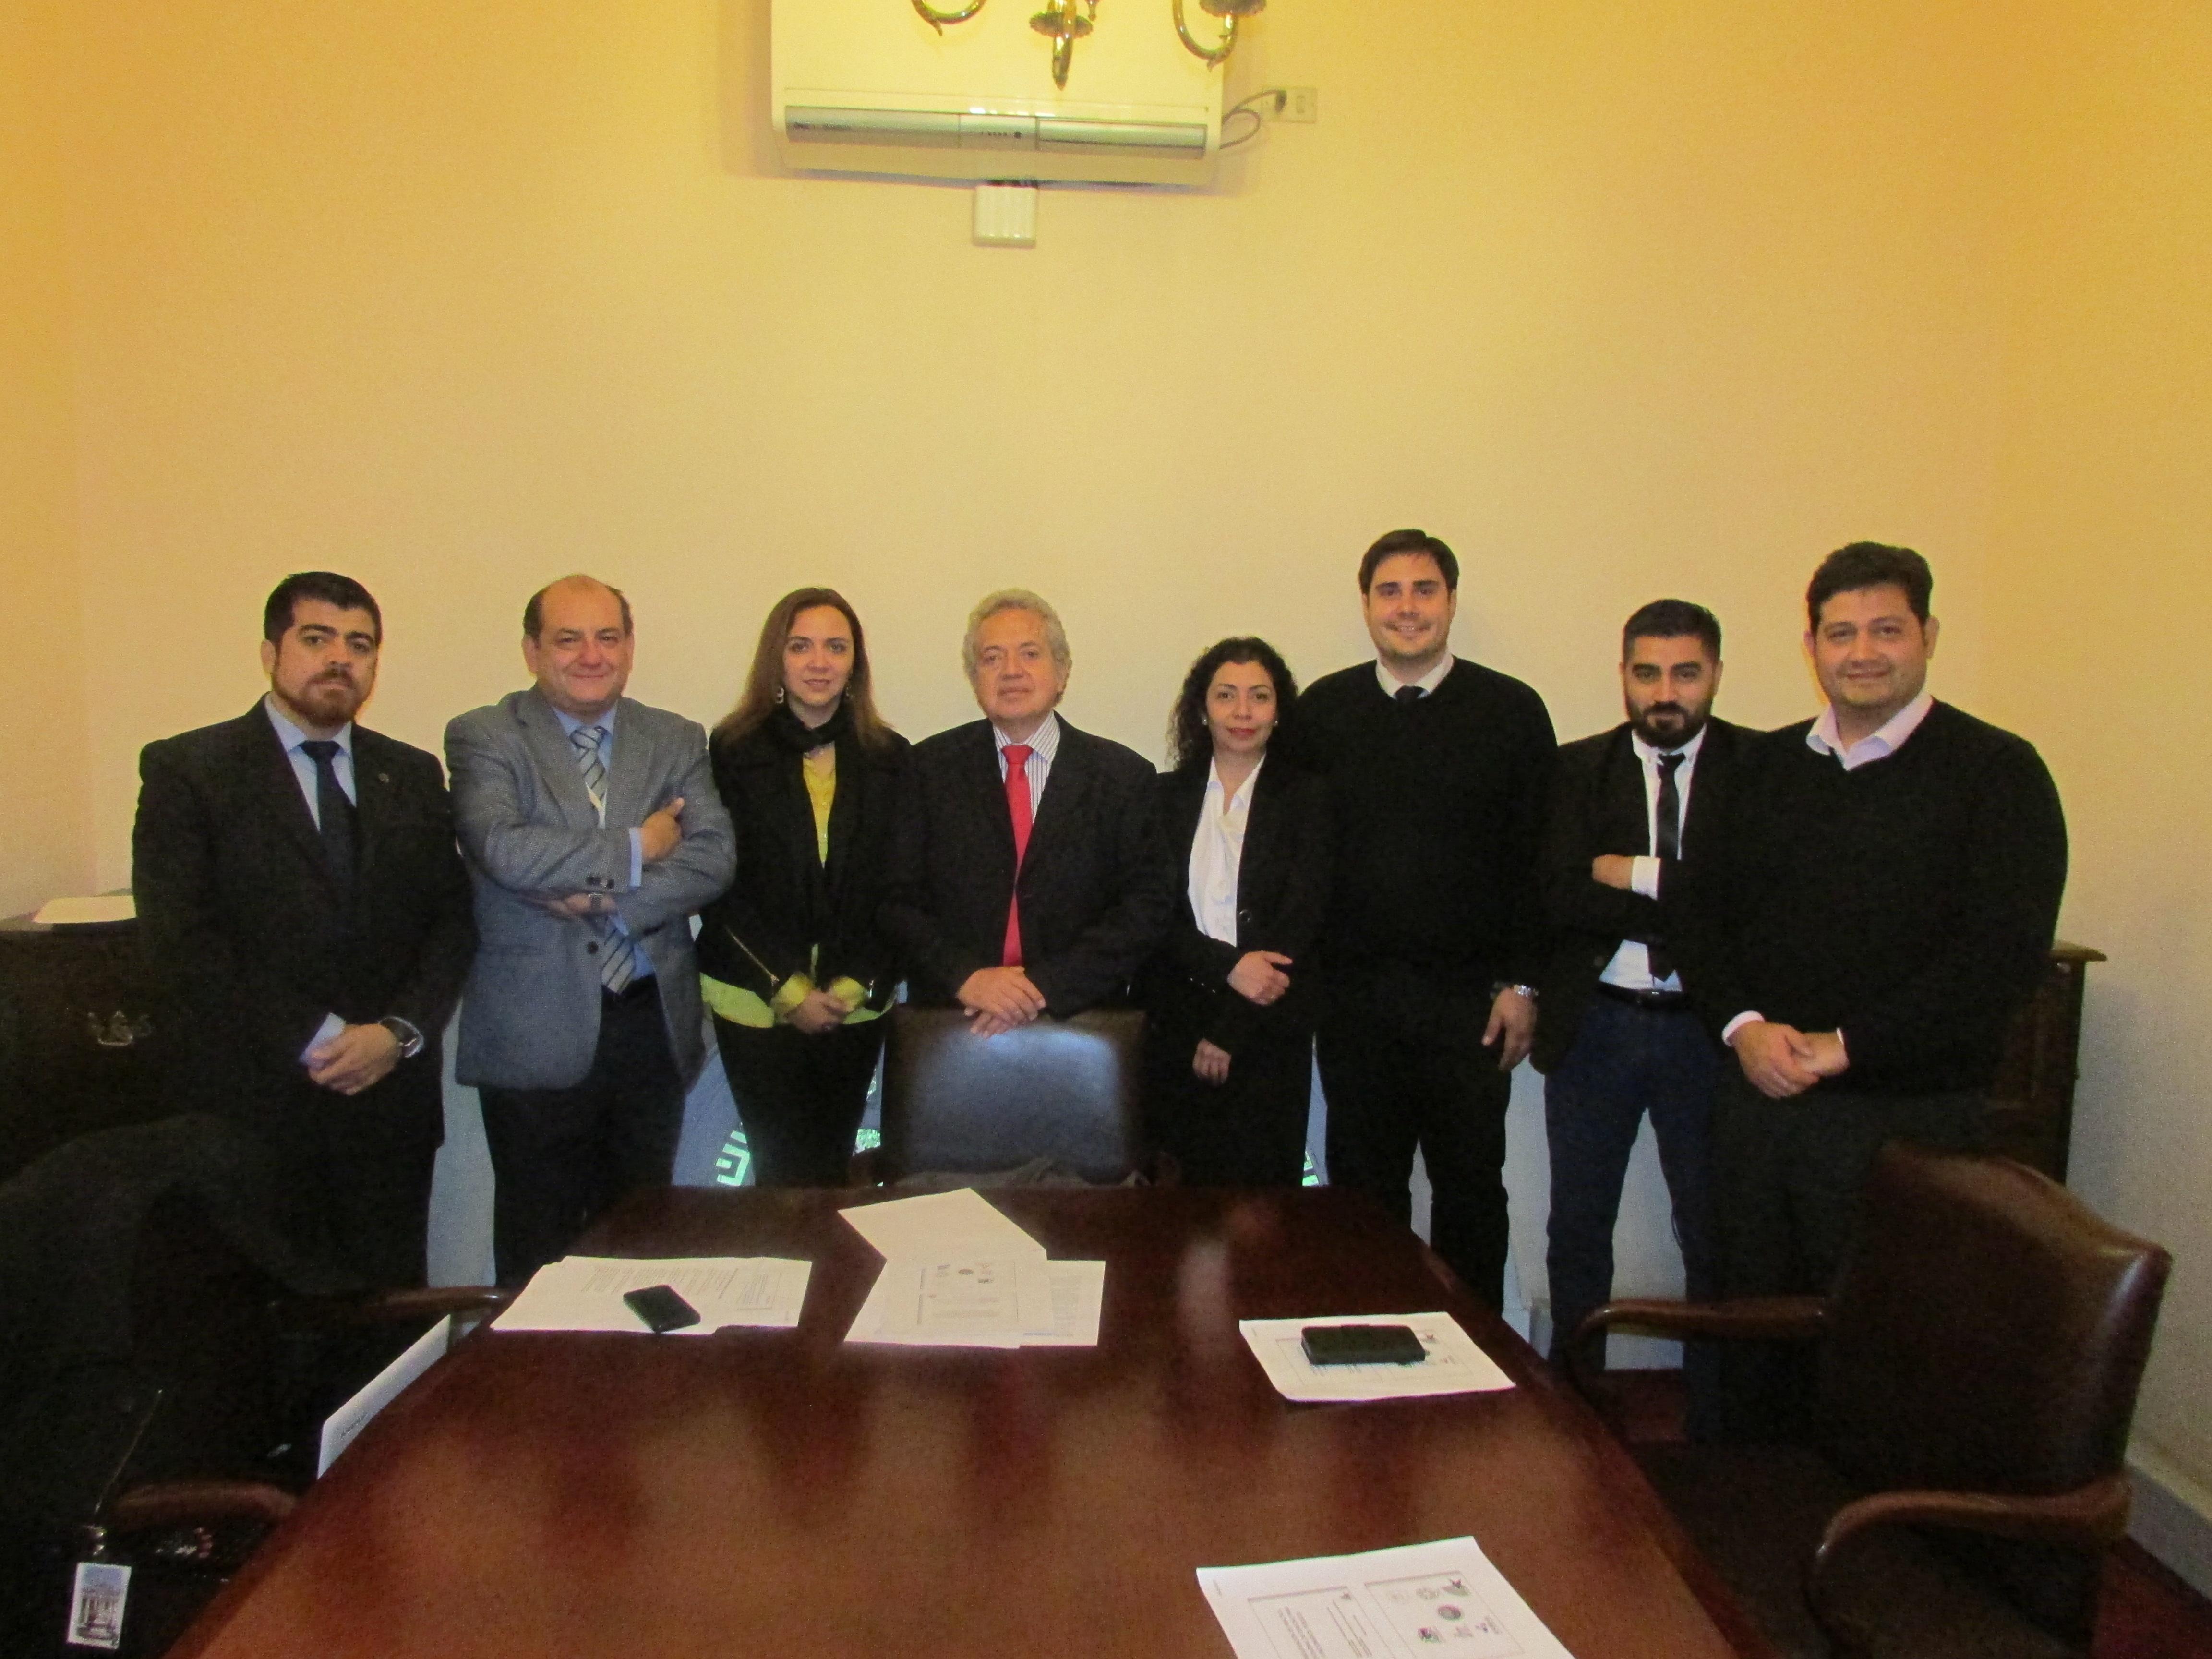 Afudep se reúne con Diputado Ceroni por proyecto Homologación Práctica Profesional - 08 Mayo 2017